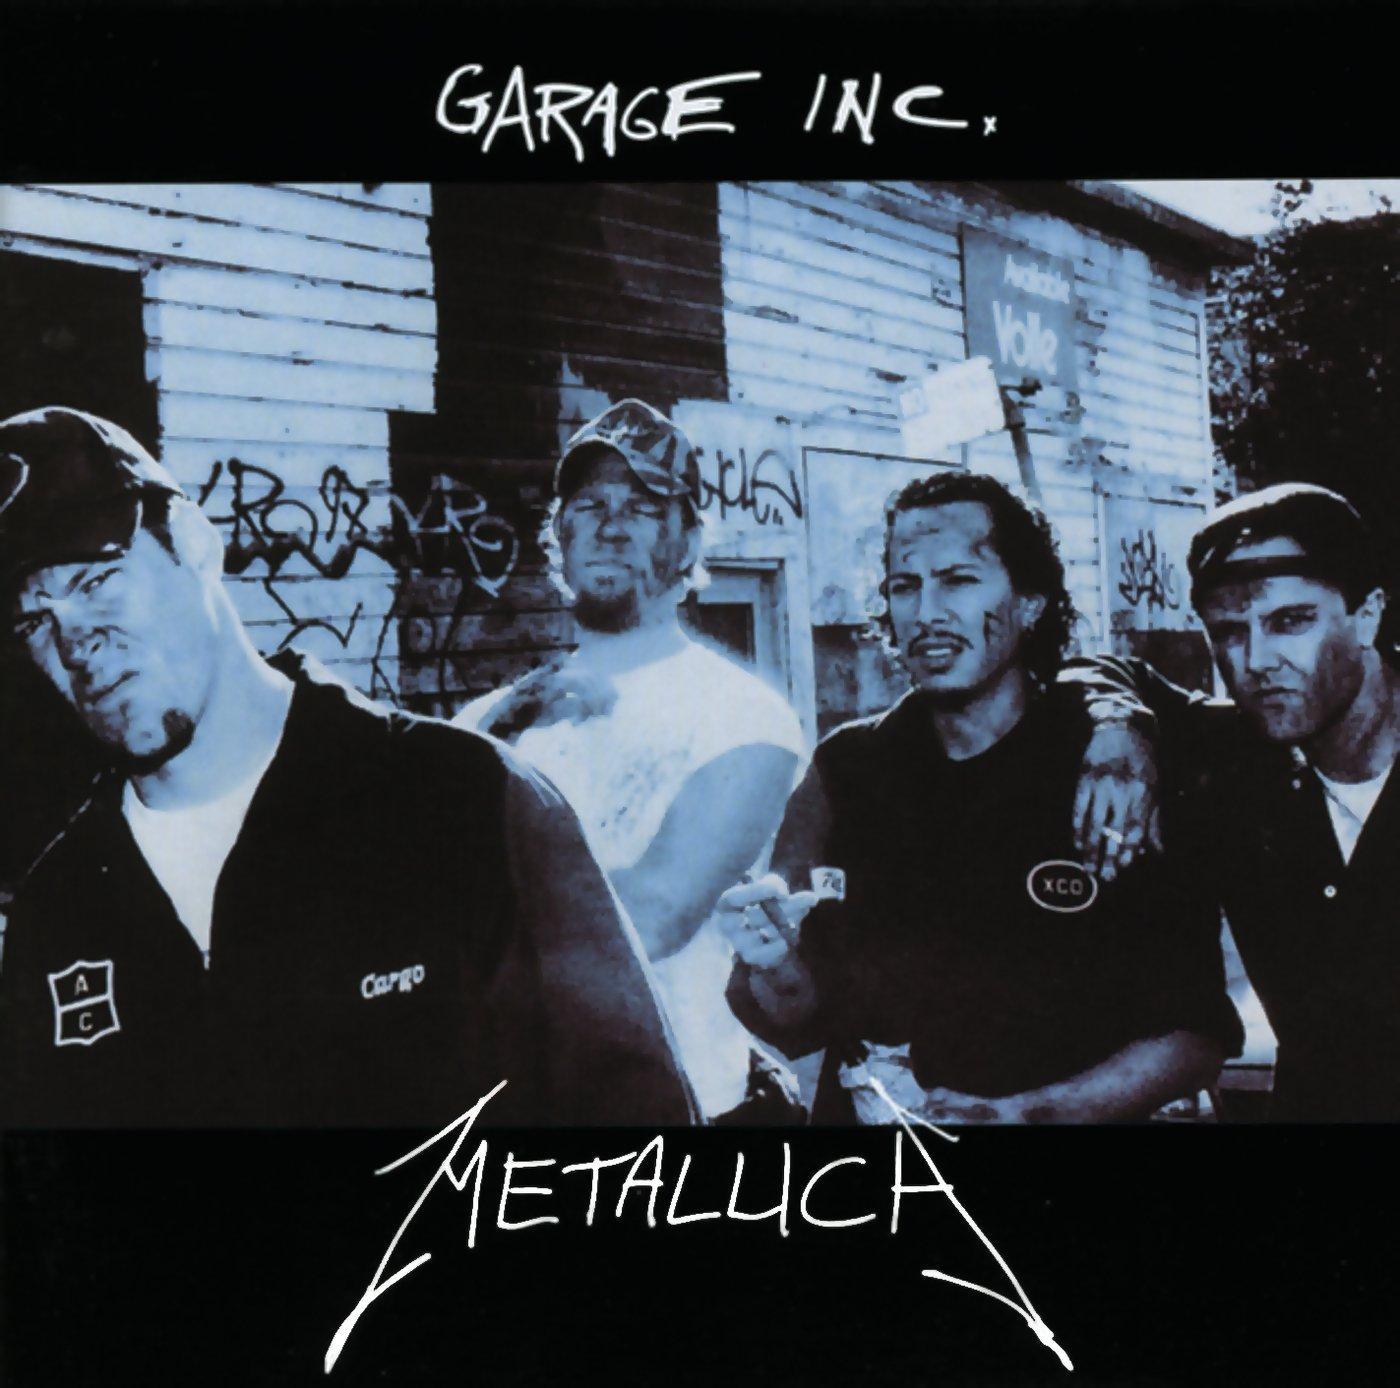 Metallica Garage Inc.